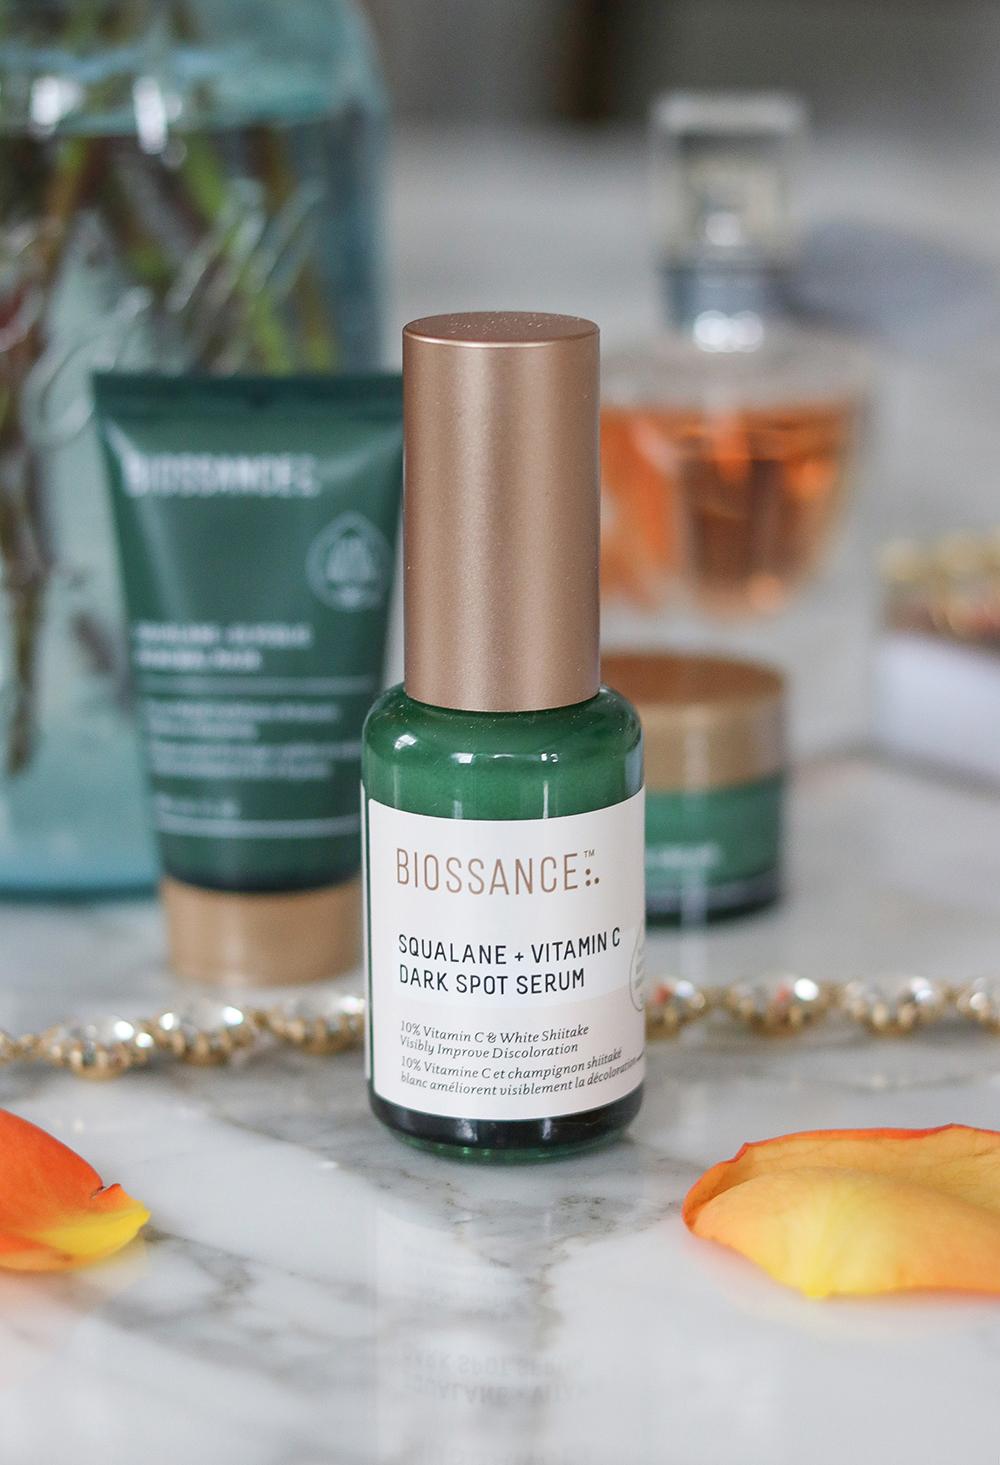 Biossance Dark Spot Serum Review I DreaminLace.com #veganskincare #cleanbeauty